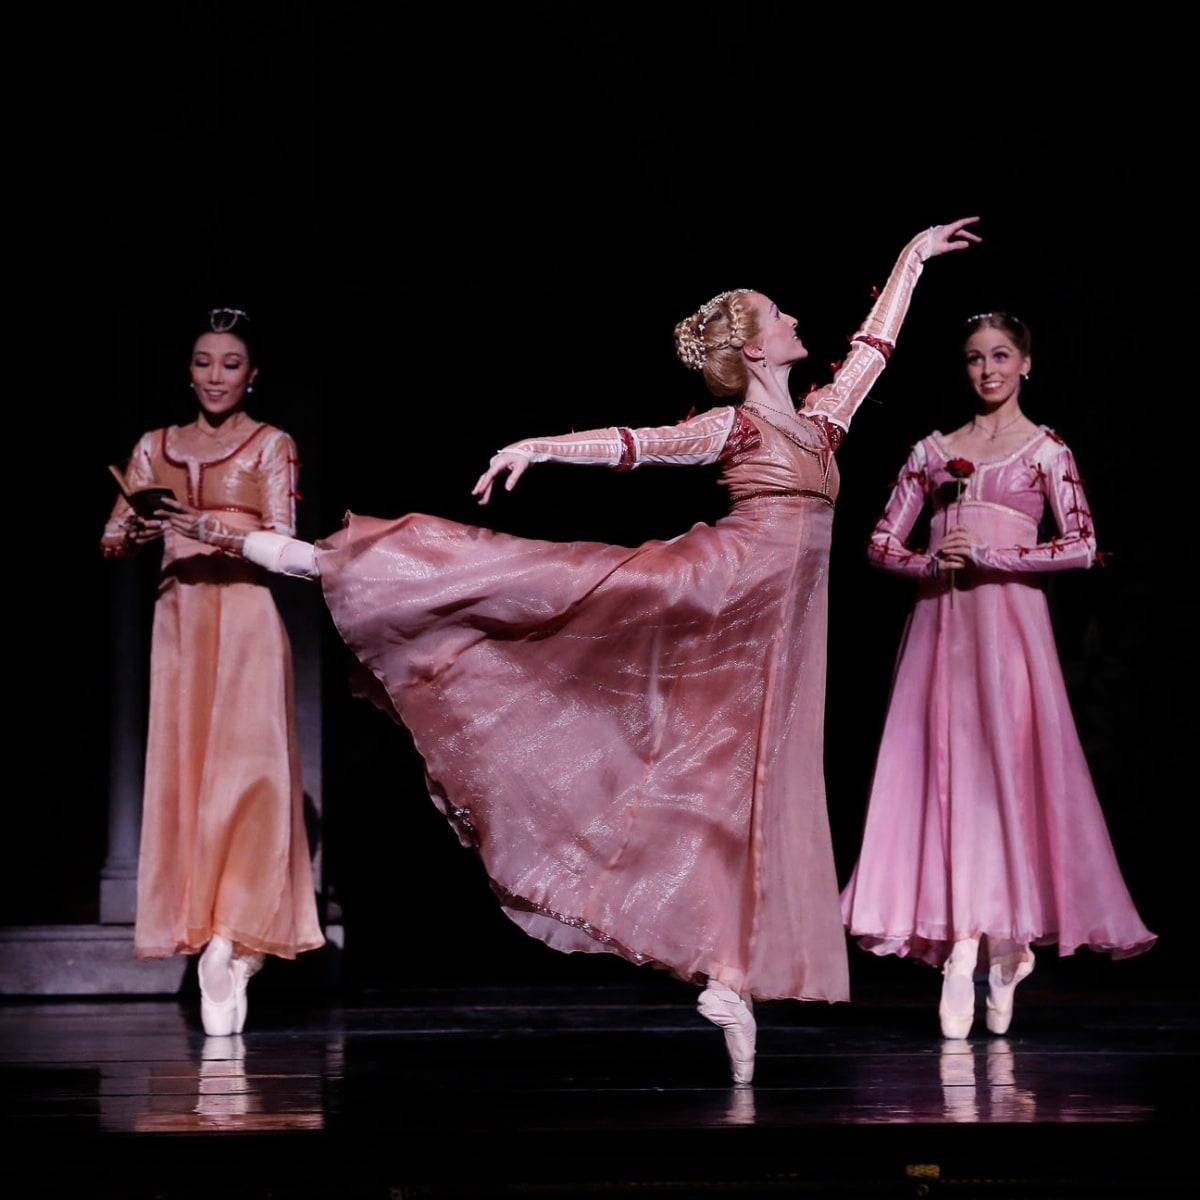 Houston Ballet in Australia, 6/17 Sara Webb in Romeo and Juliet